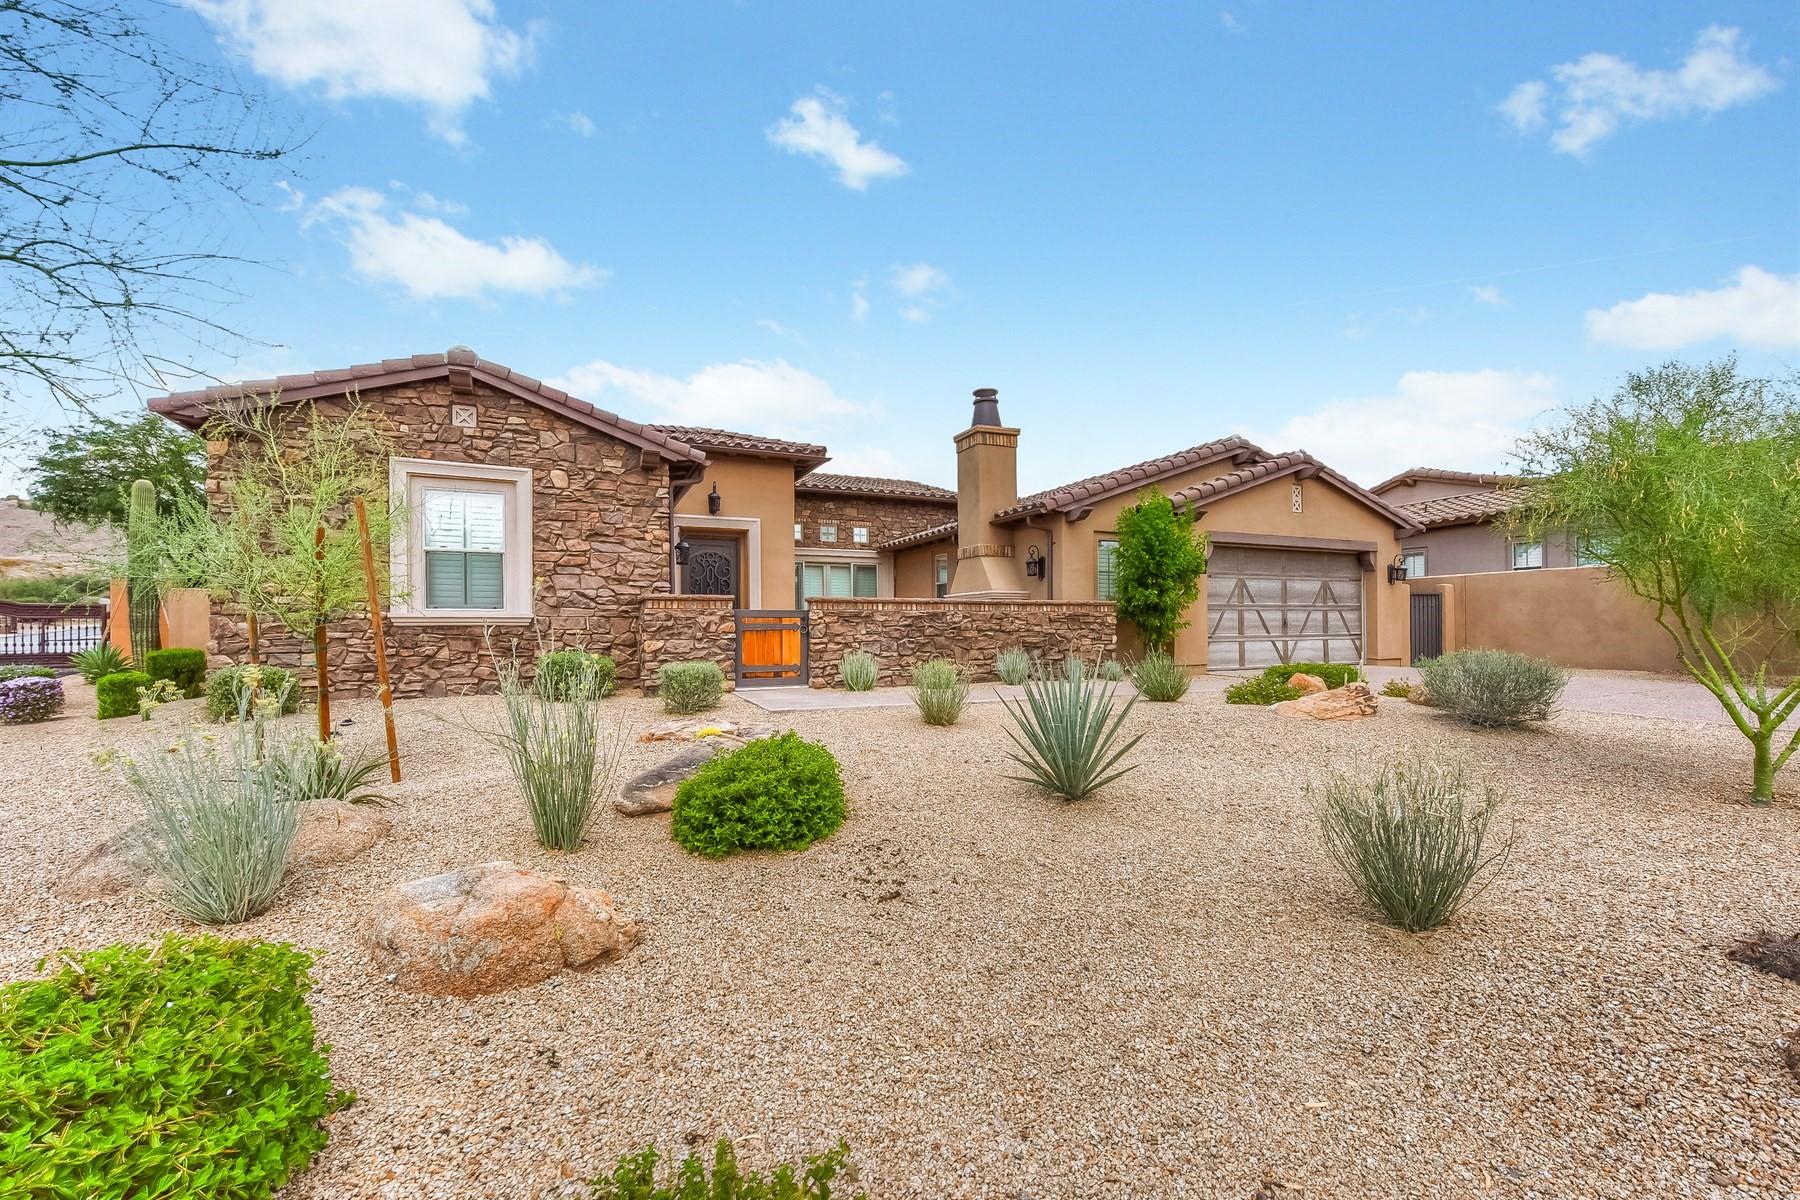 Villa per Vendita alle ore Lovely Scottsdale home in Quisana at Troon North 27600 N 110th Pl, Scottsdale, Arizona, 85262 Stati Uniti